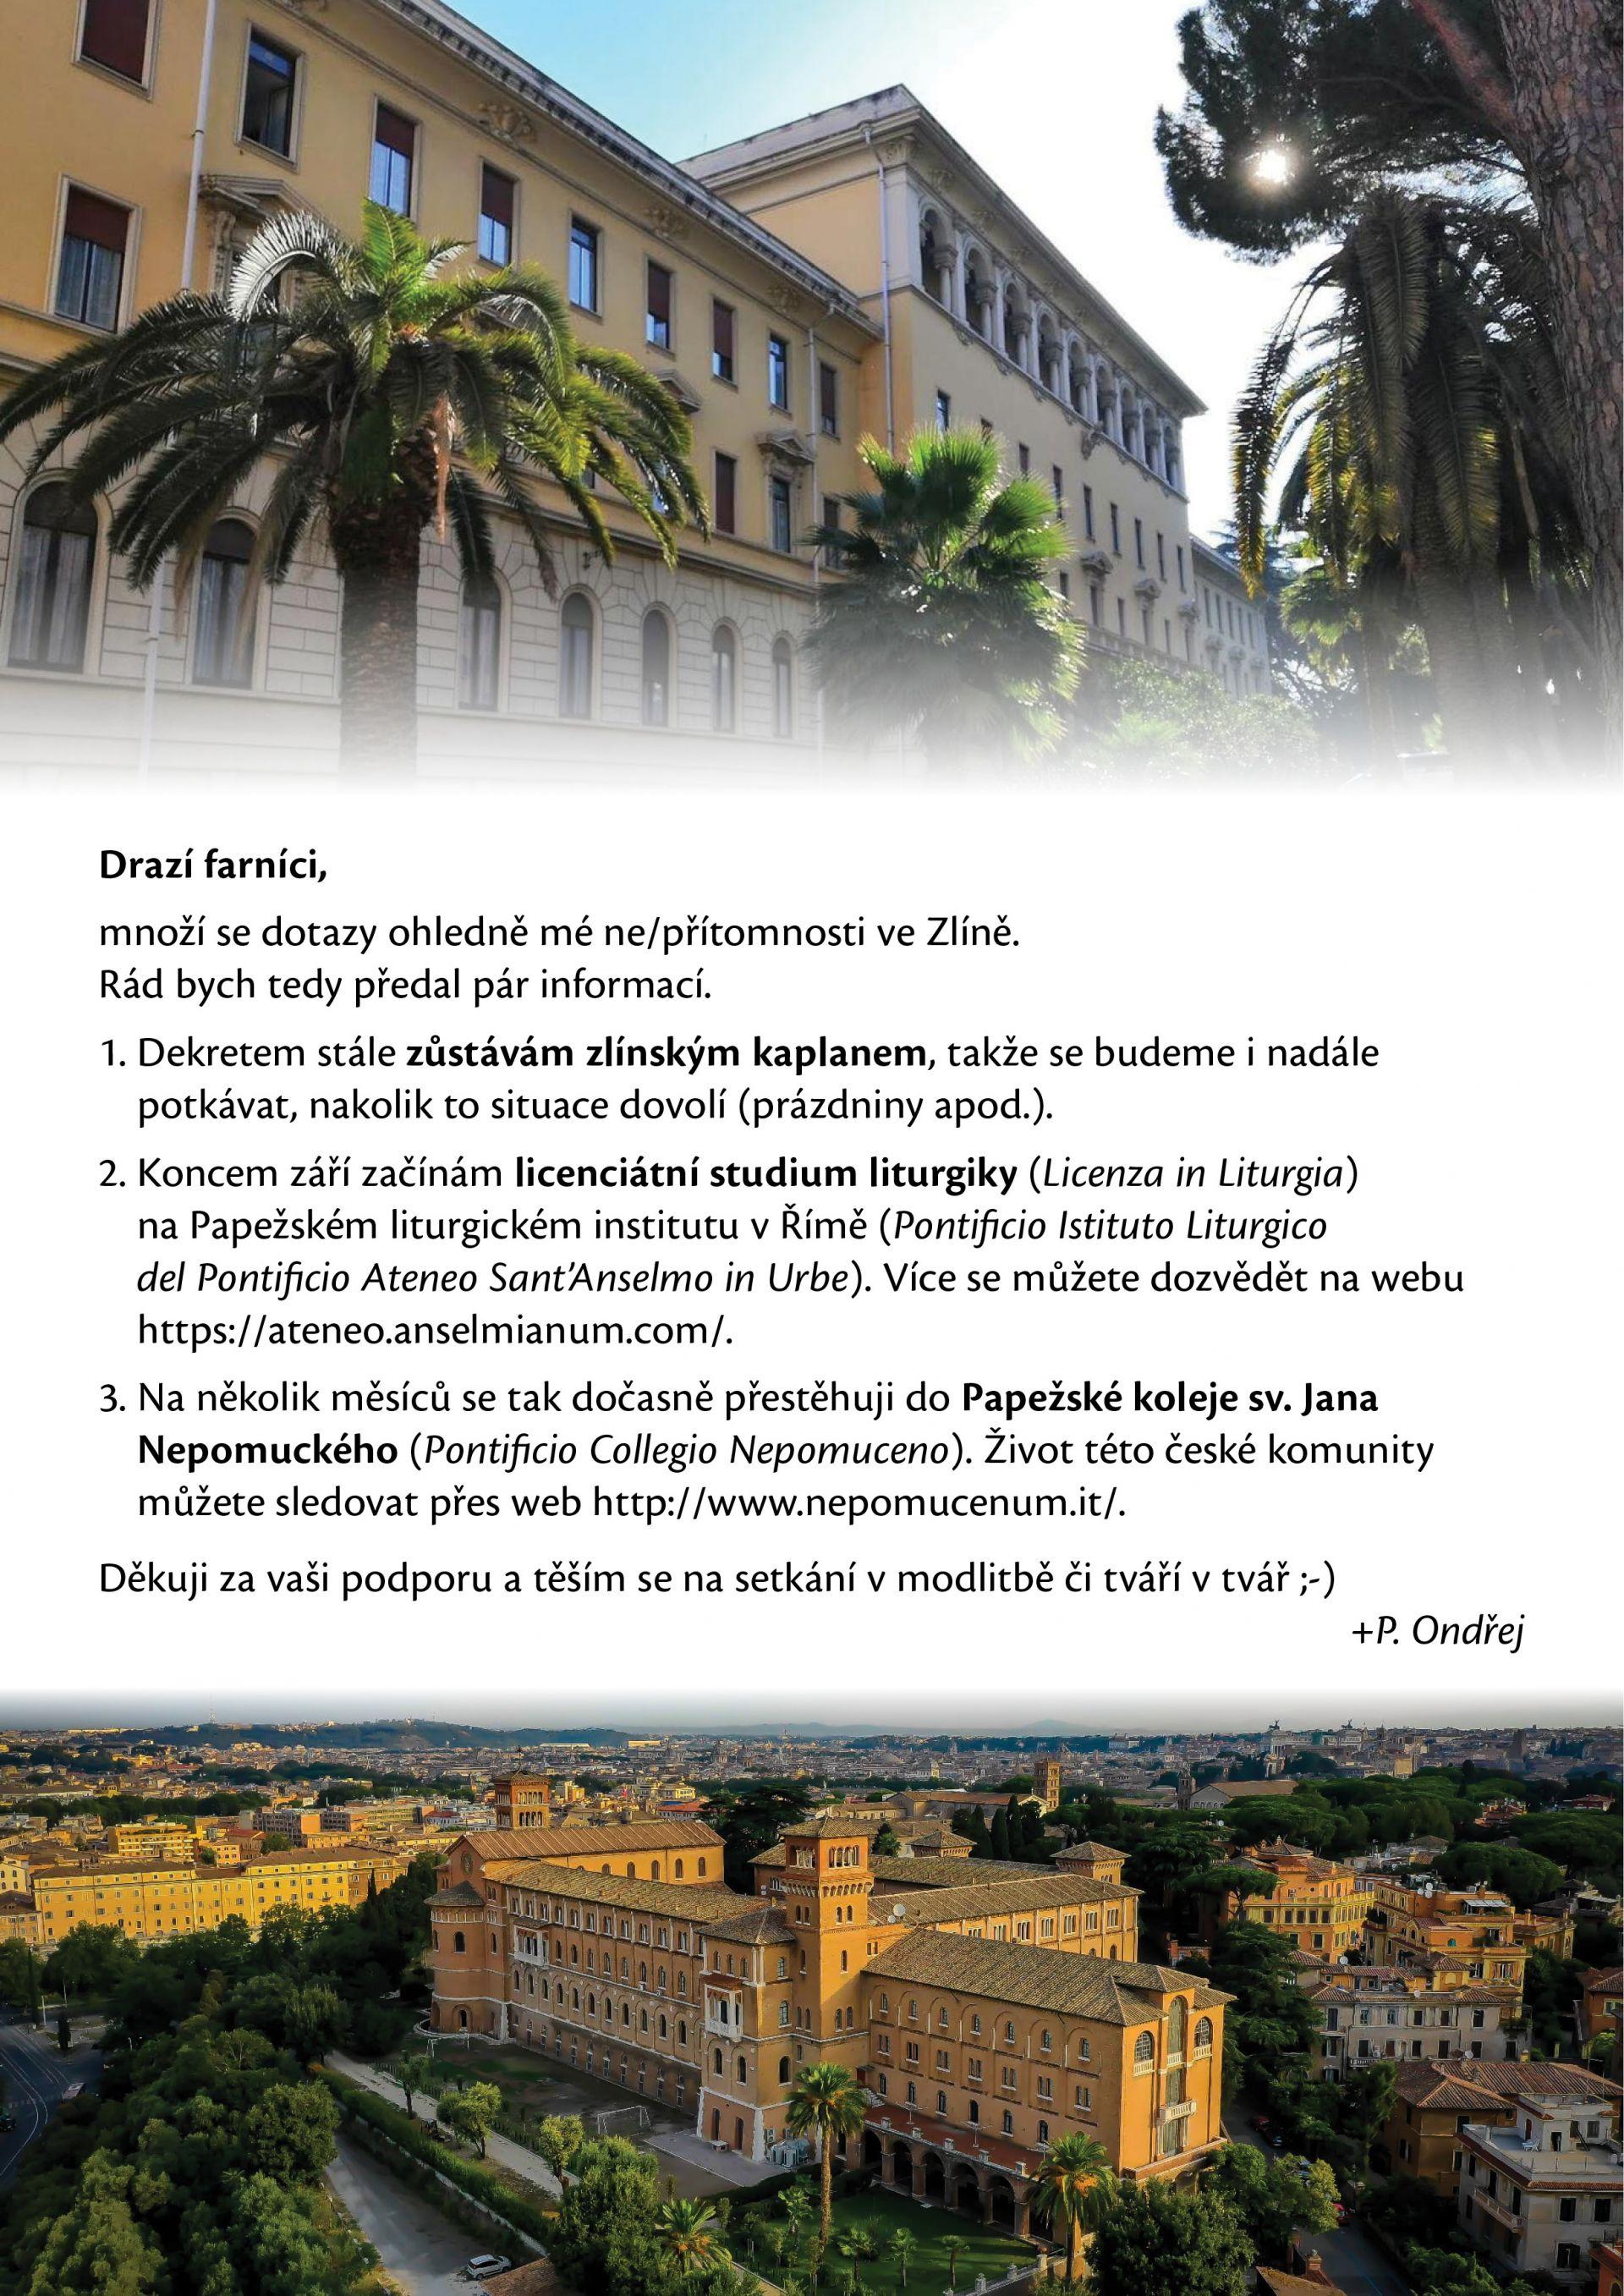 P. Ondrej Rim